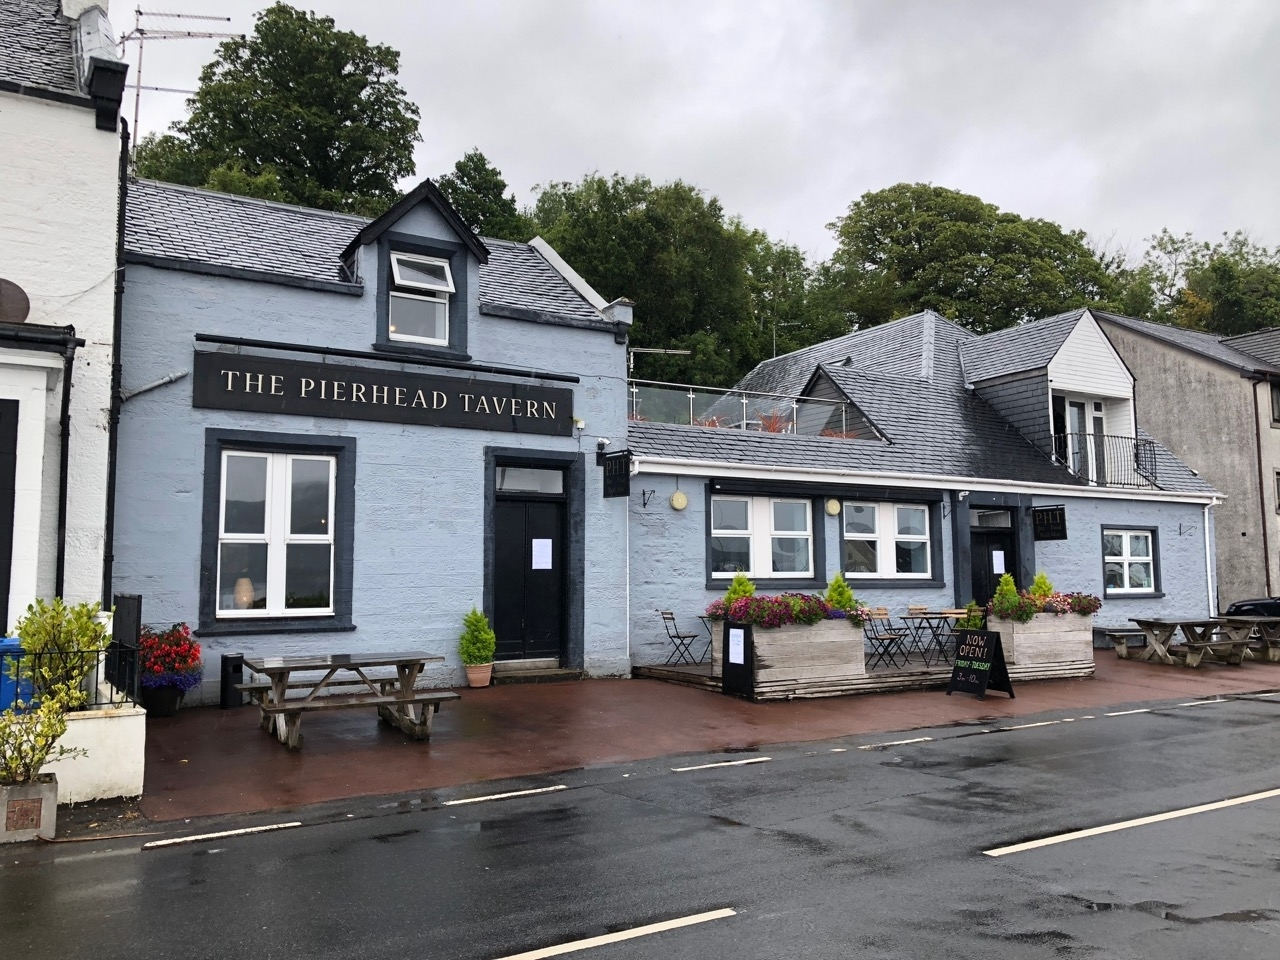 Pierhead Tavern (PHT)